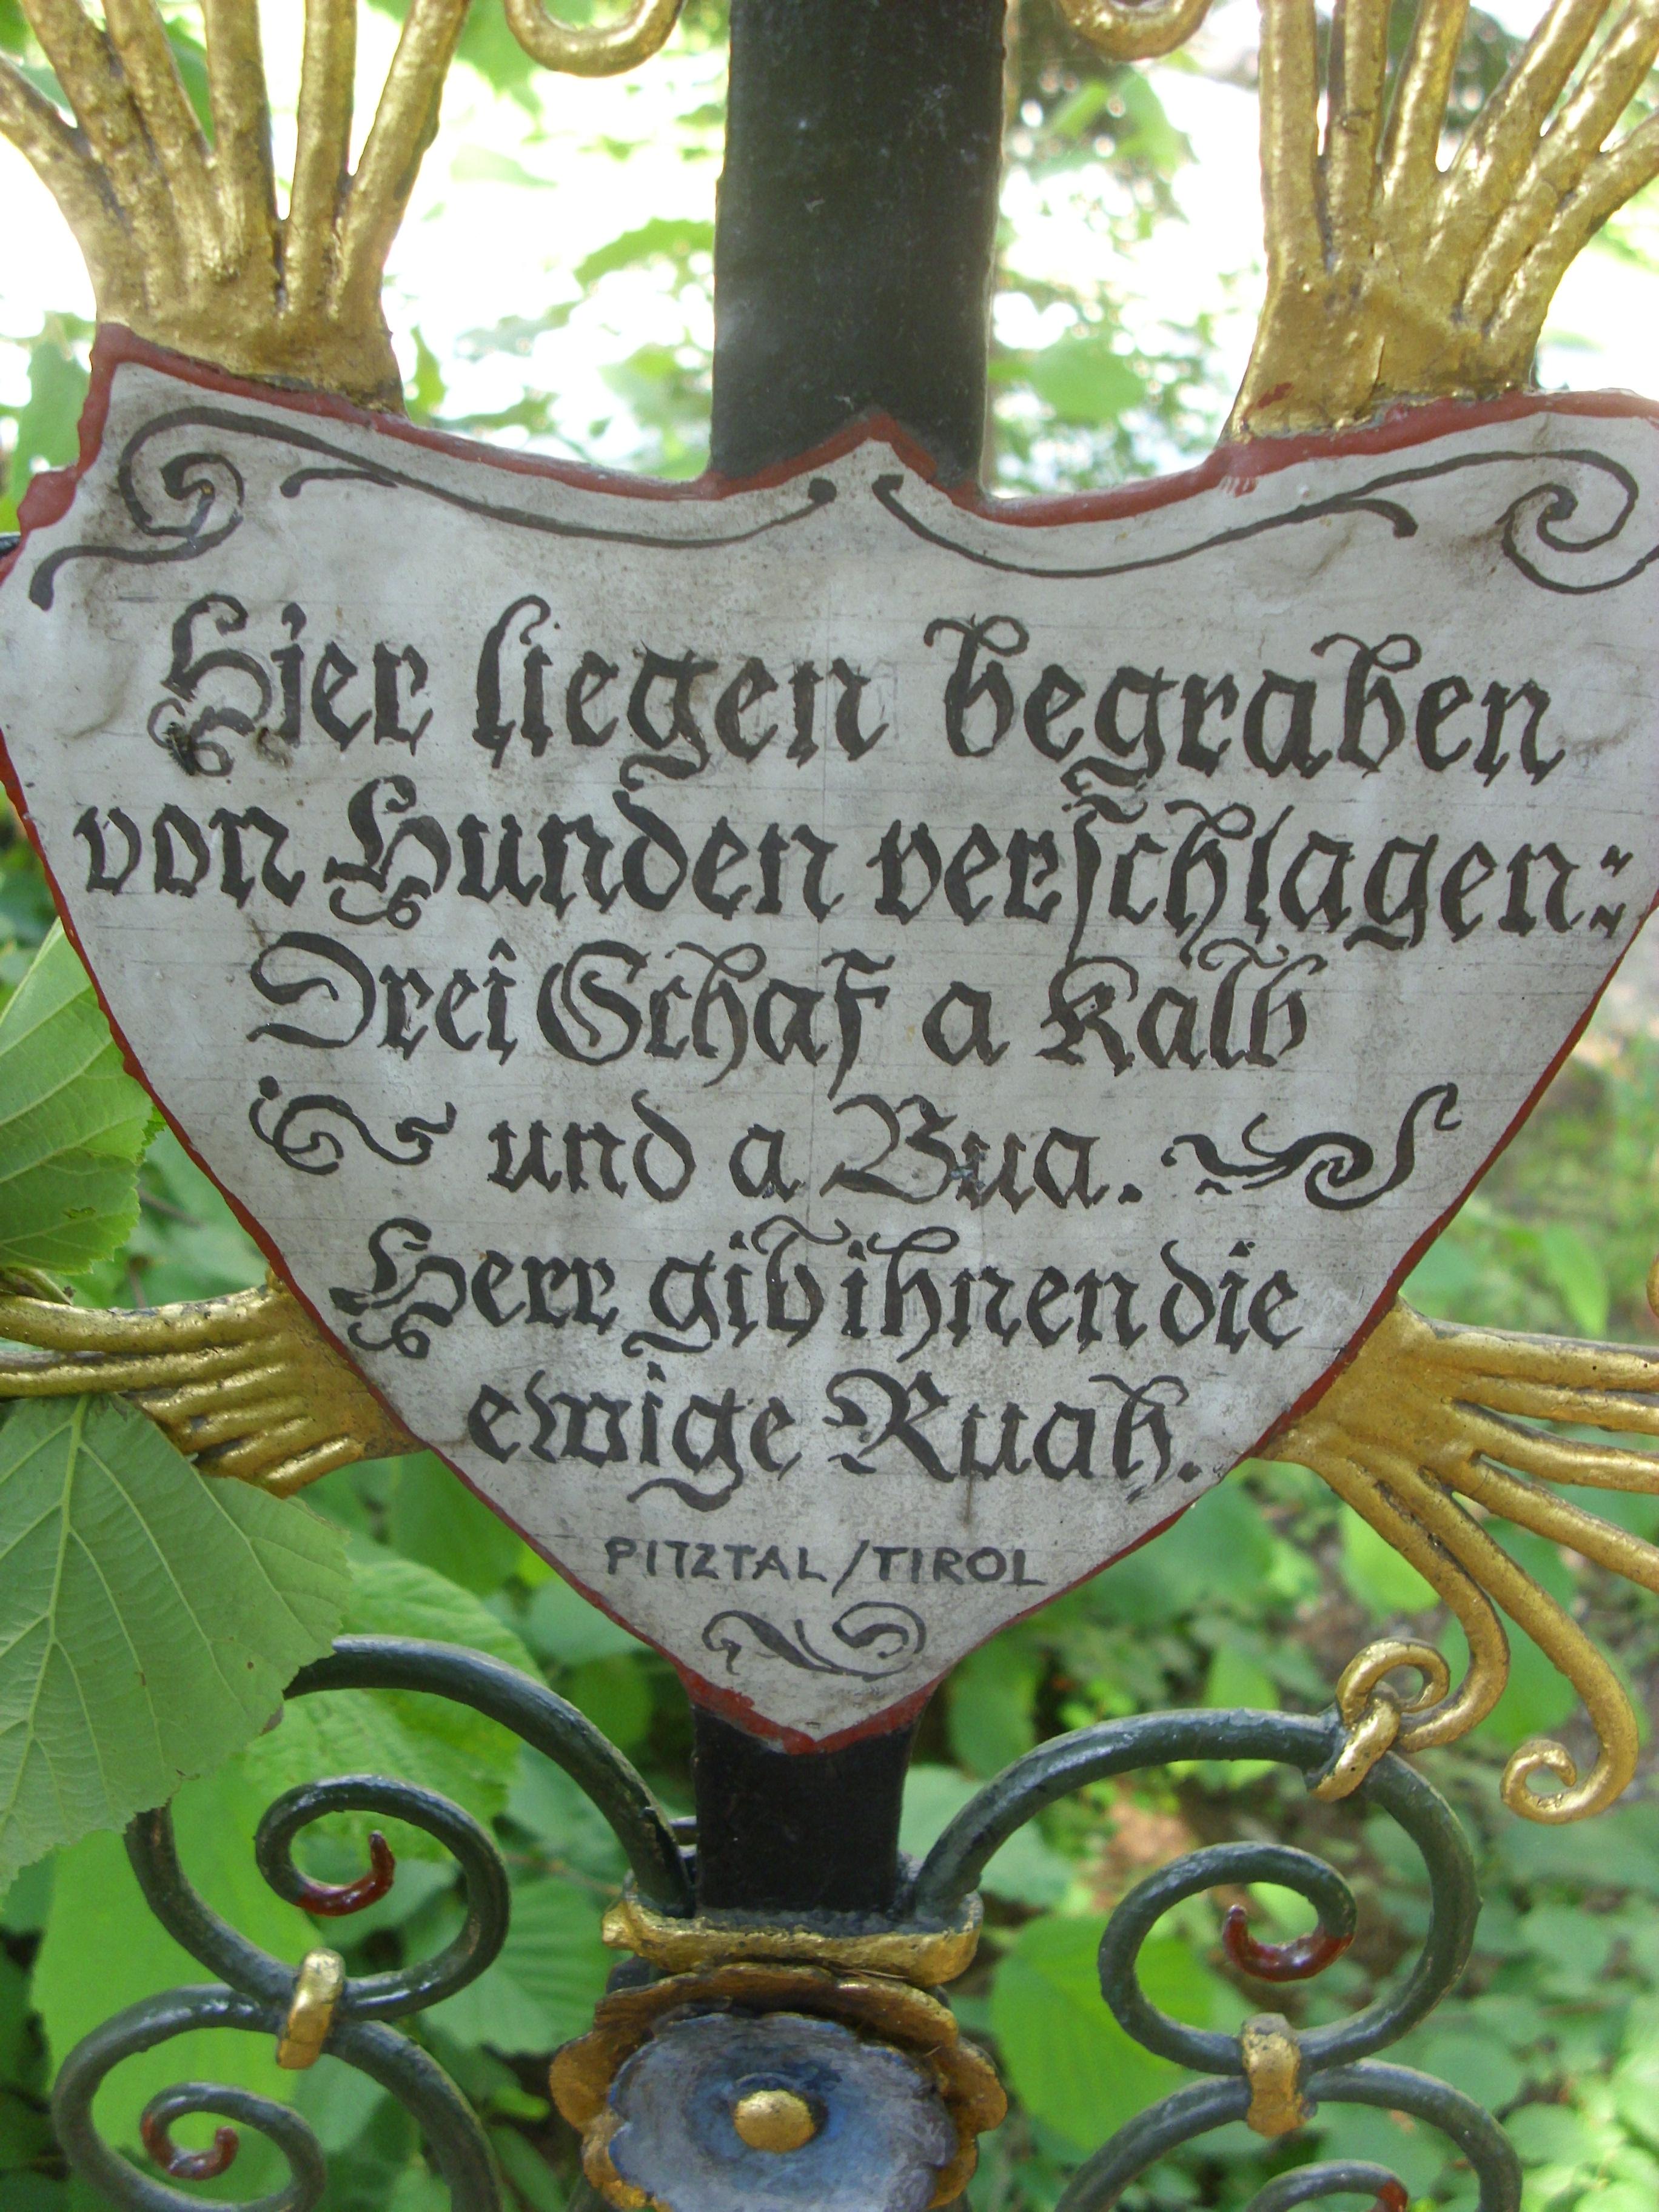 Filegrabkreuz Des Museumsfriedhof In Kramsach15jpg Wikimedia Commons